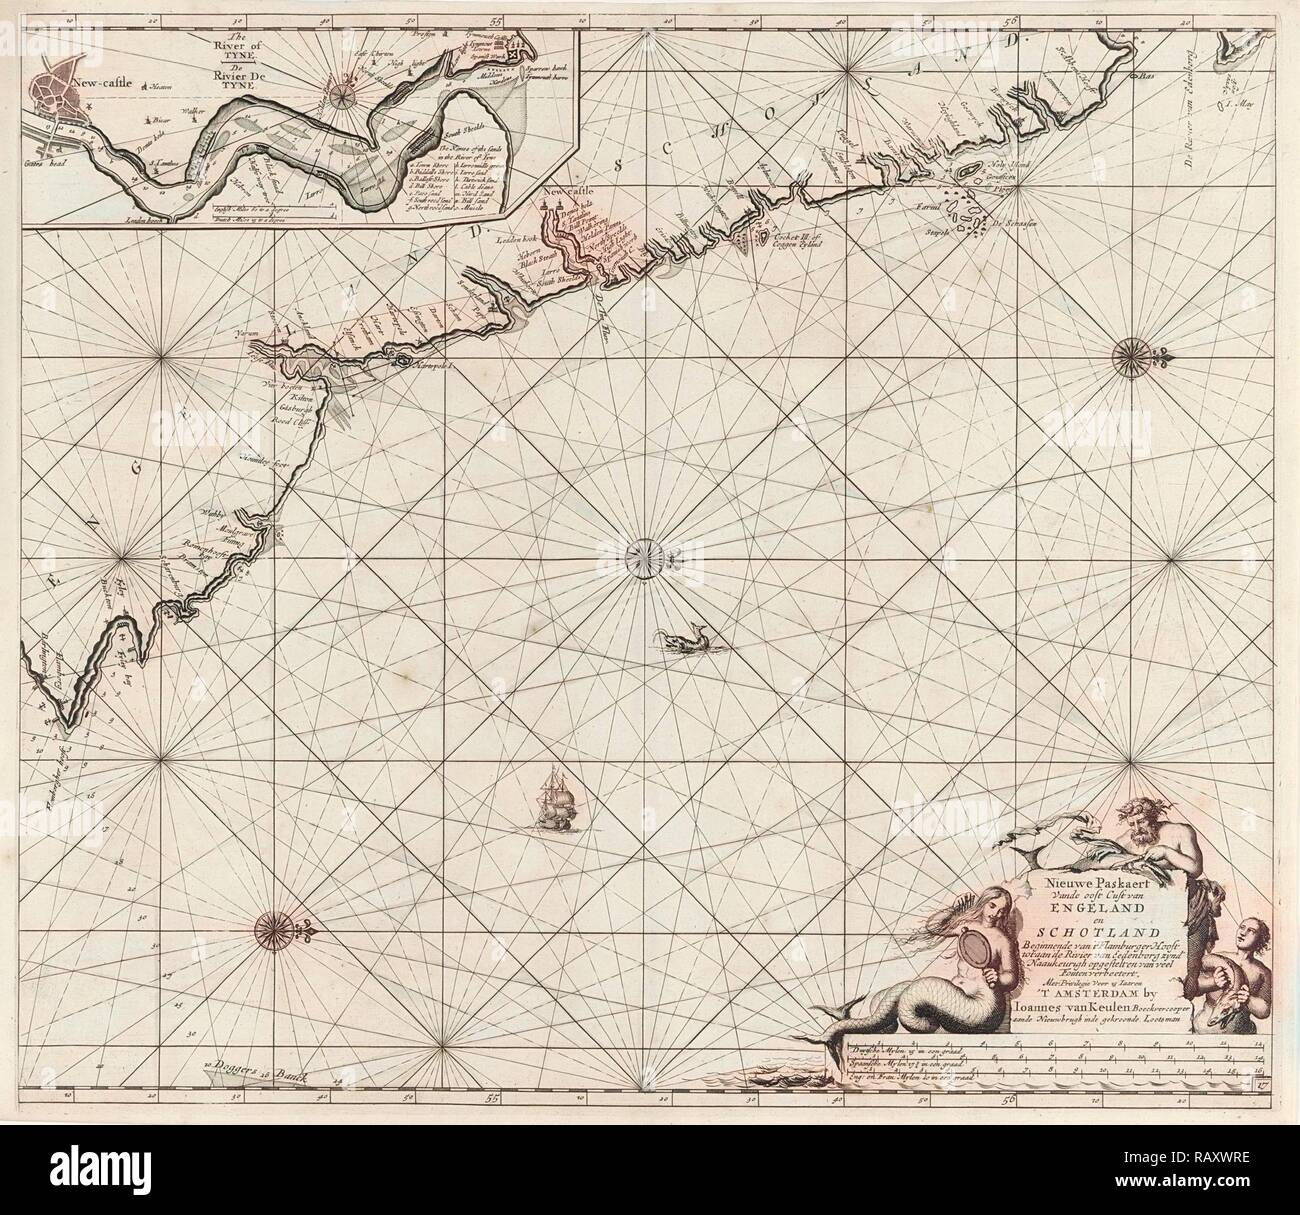 Sea chart of part of the northeast coast of England and part of Scotland, Jan Luyken, Johannes van Keulen (I reimagined - Stock Image